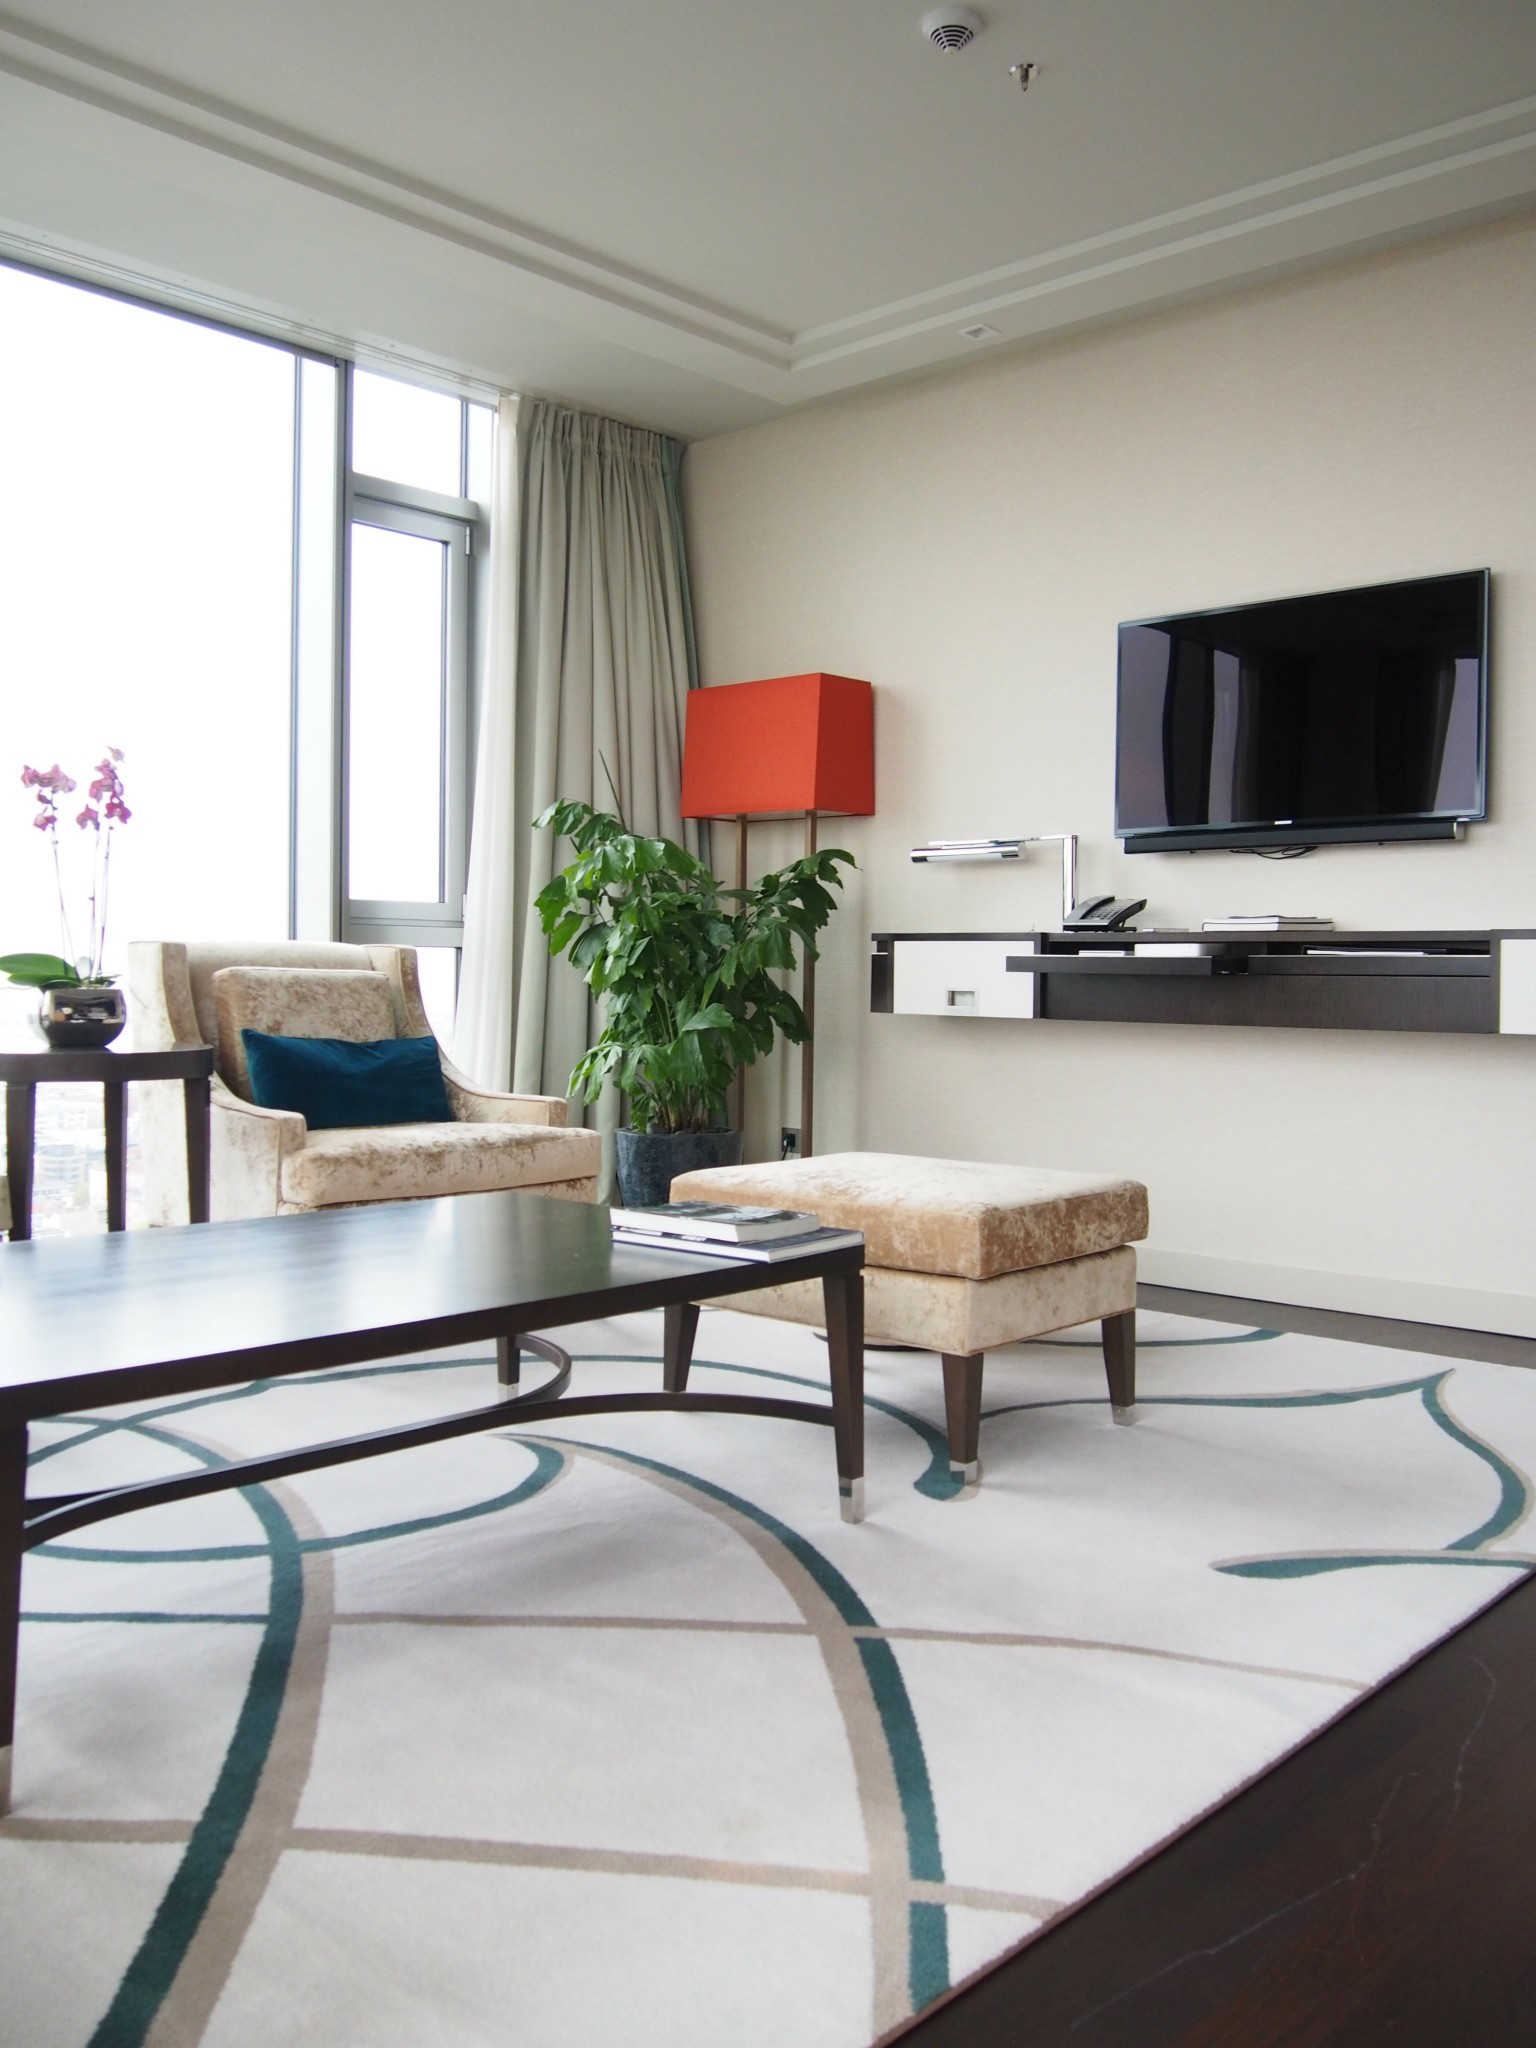 Waldorf Astoria Berlin Tower Suite olohuone 3